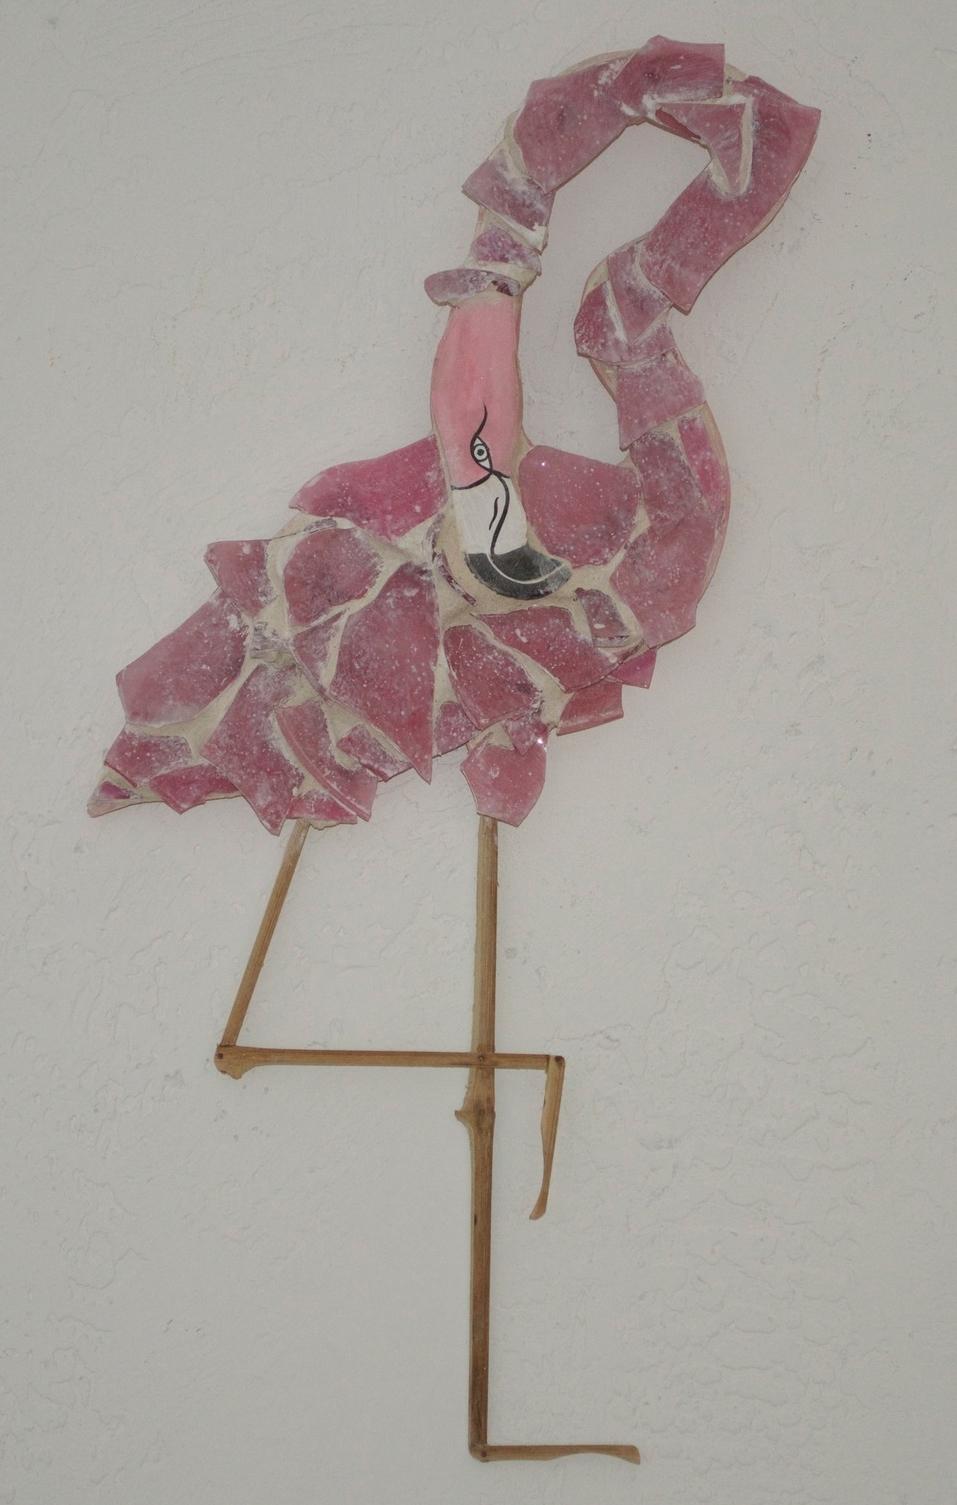 "Beach Art - Flamingo - wood, glass, bamboo - 9"" x 21"" - $65"